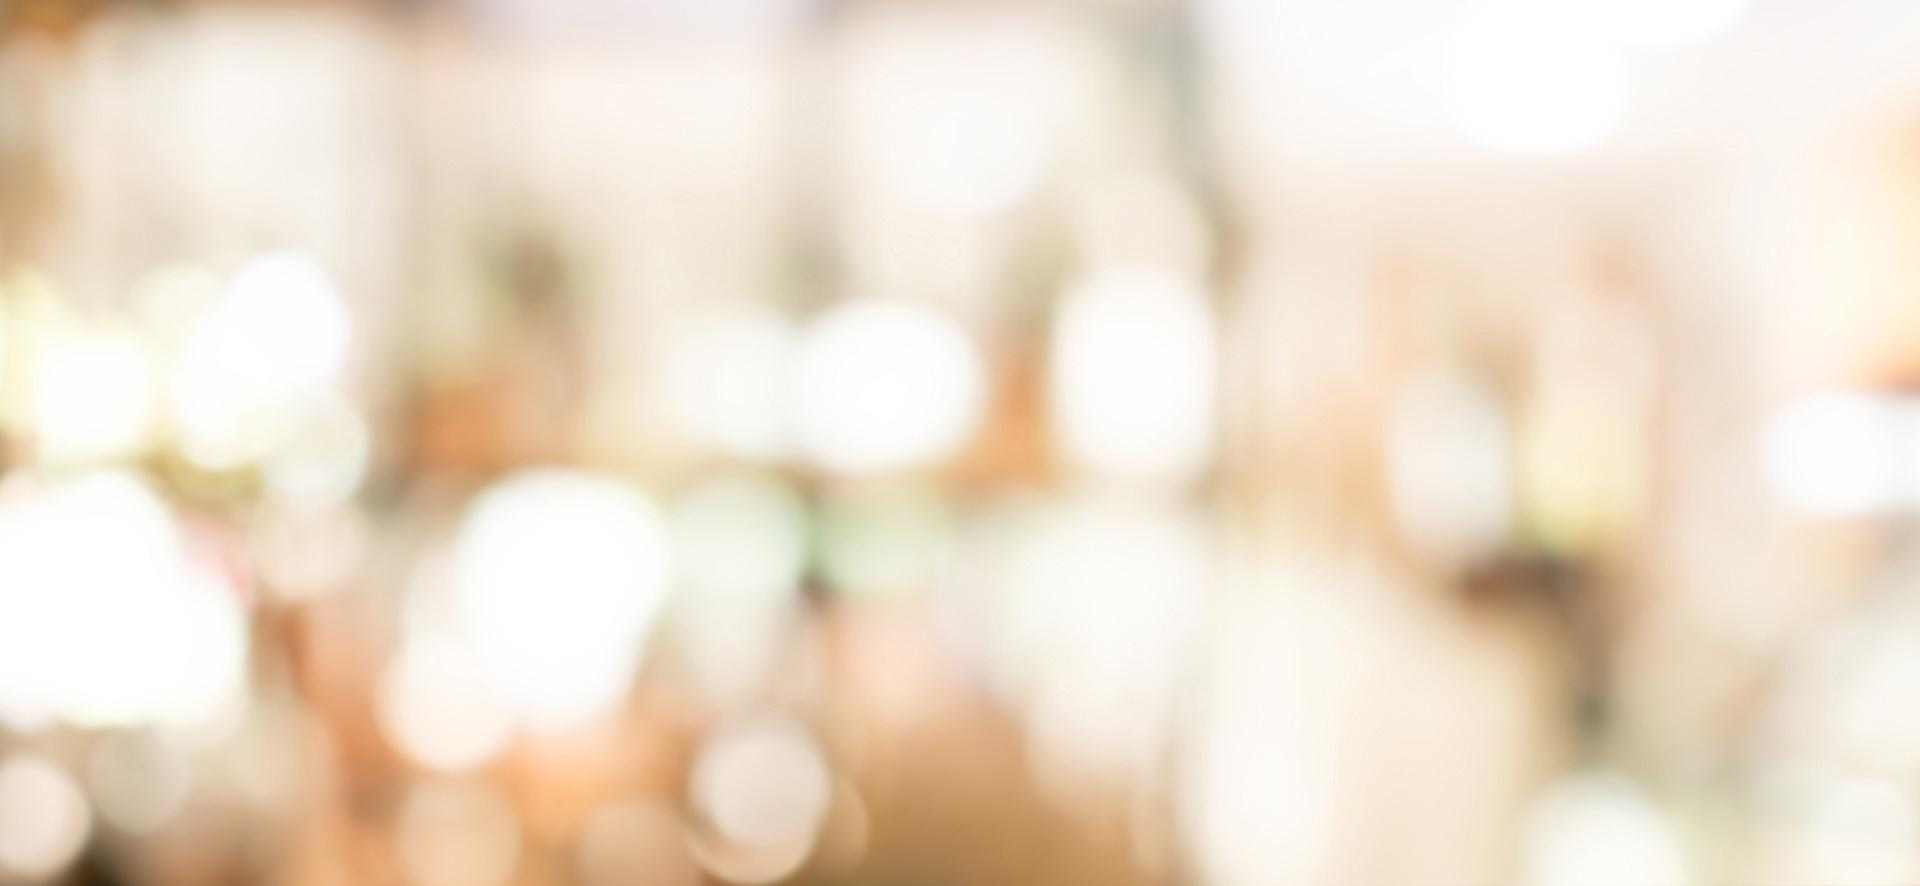 table-blur-bg.jpg